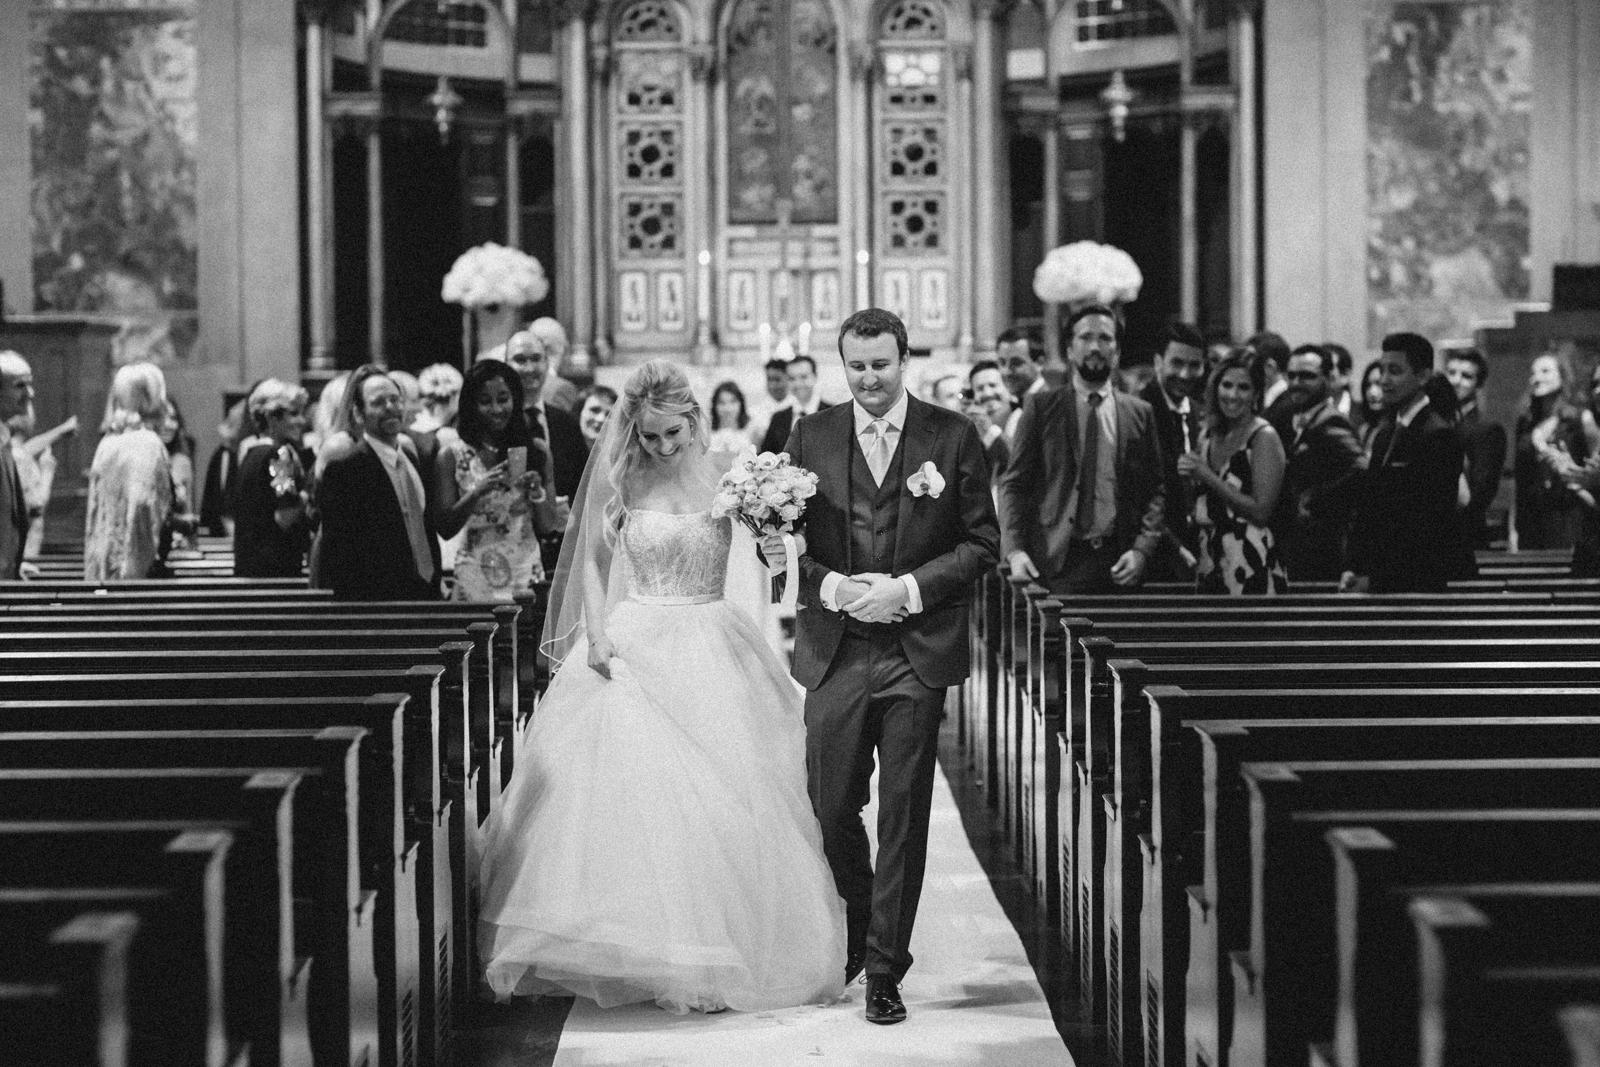 NYC Wedding Photography Sofitel Central Park Brooklyn Photographer Boris Zaretsky _B2C2402.jpg